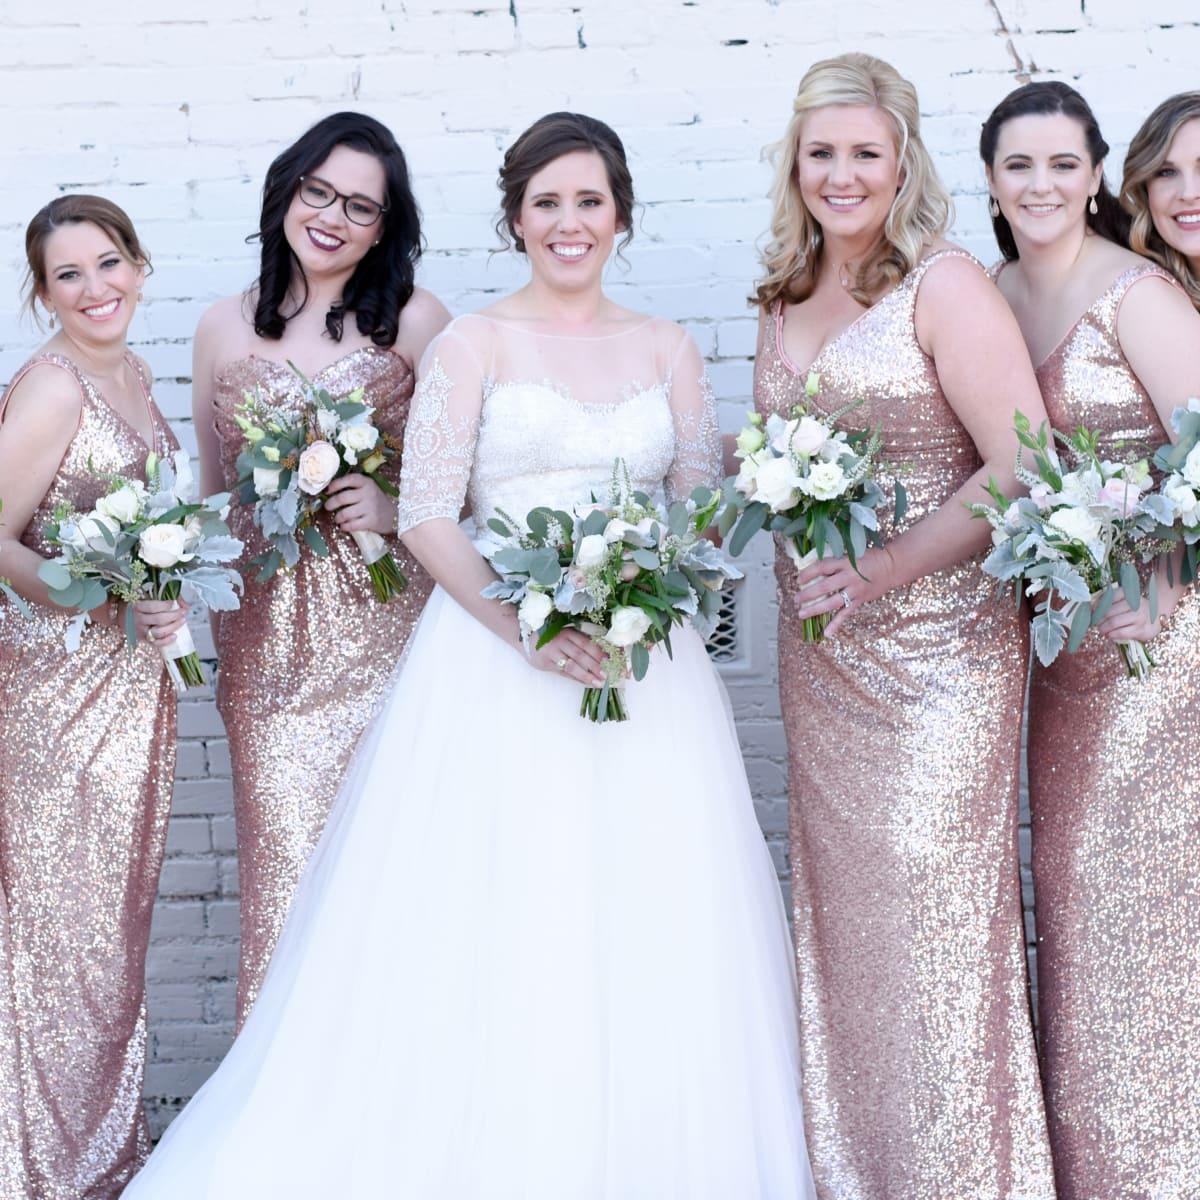 Beville Wedding, Bridesmaids